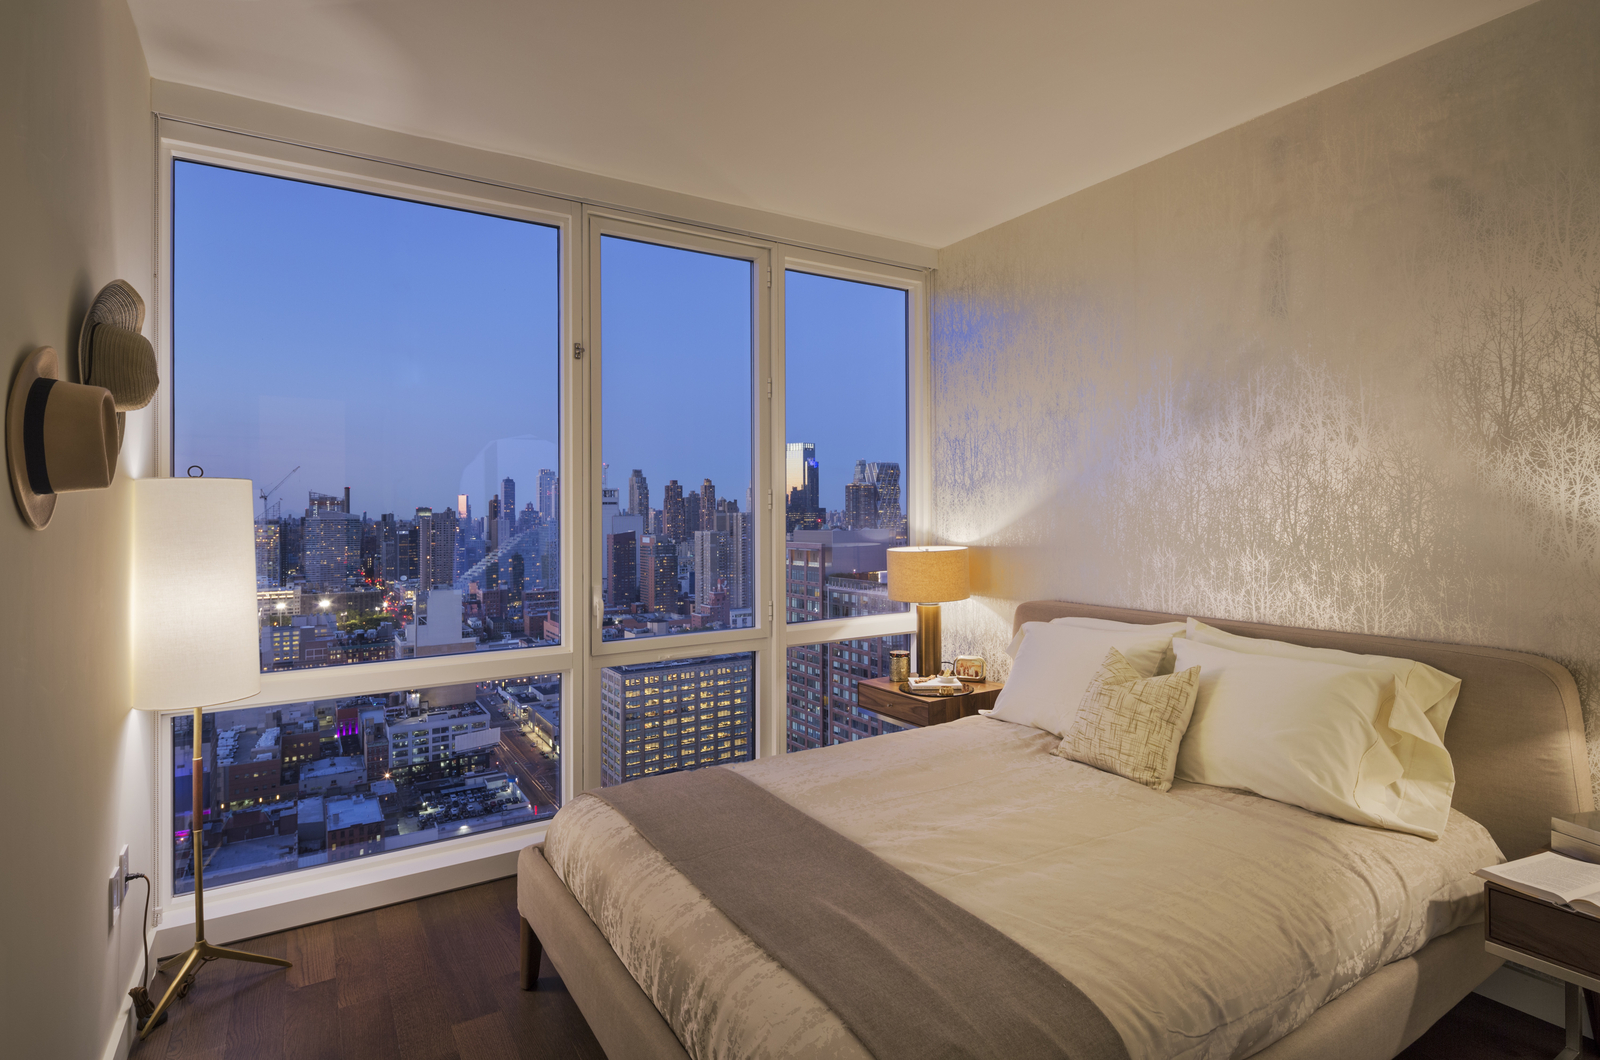 Knicks star kristaps porzingis rents 8k month midtown for 42nd street salon